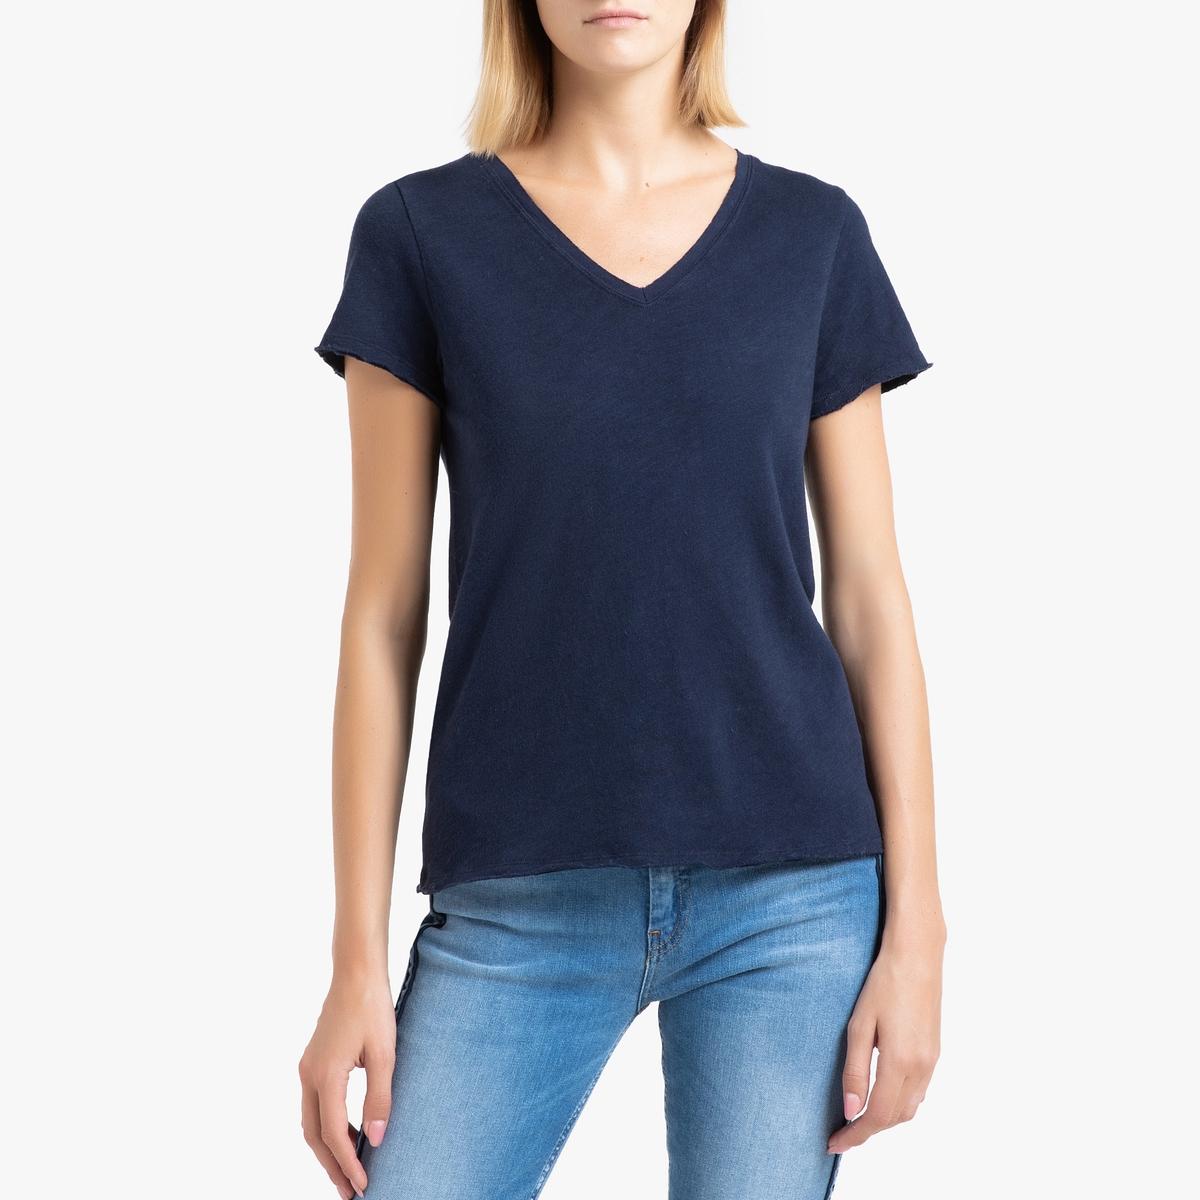 Футболка La Redoute С v-образным вырезом и короткими рукавами SONOMA M синий футболка la redoute с v образным вырезом короткими рукавами и принтом спереди l белый